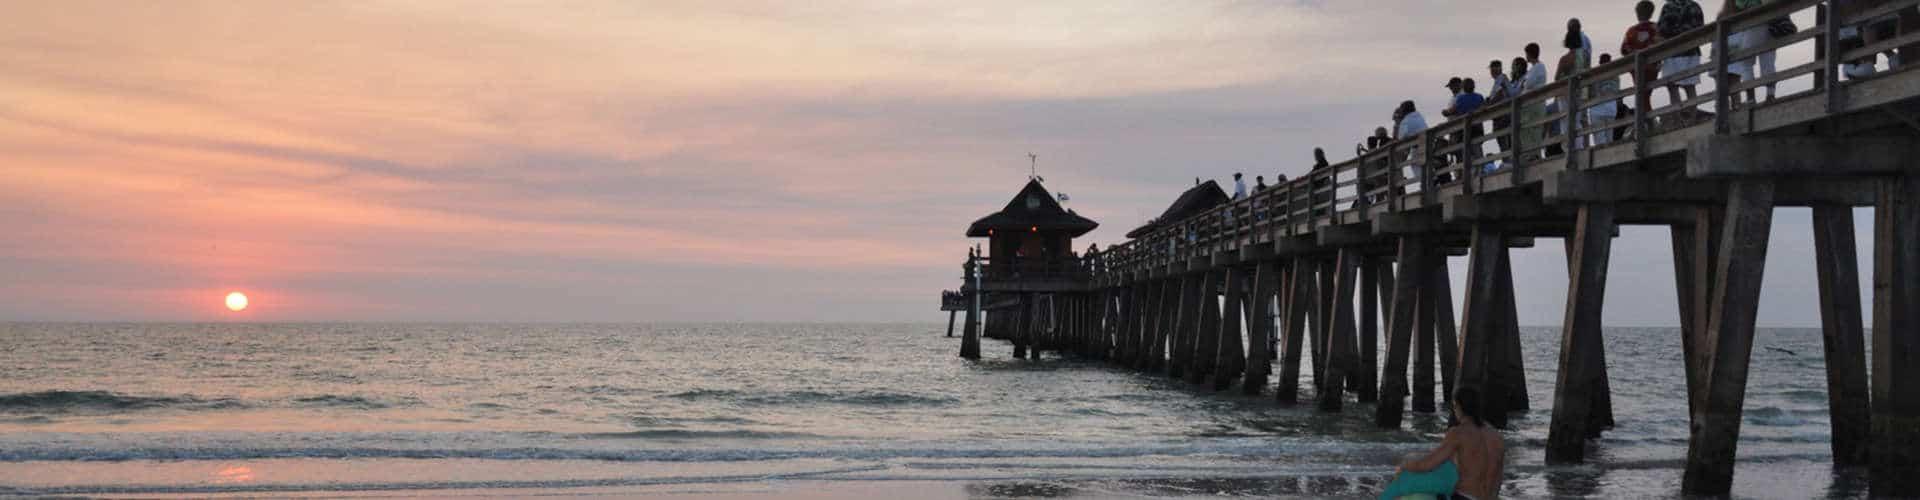 Naples Pier sunset photo